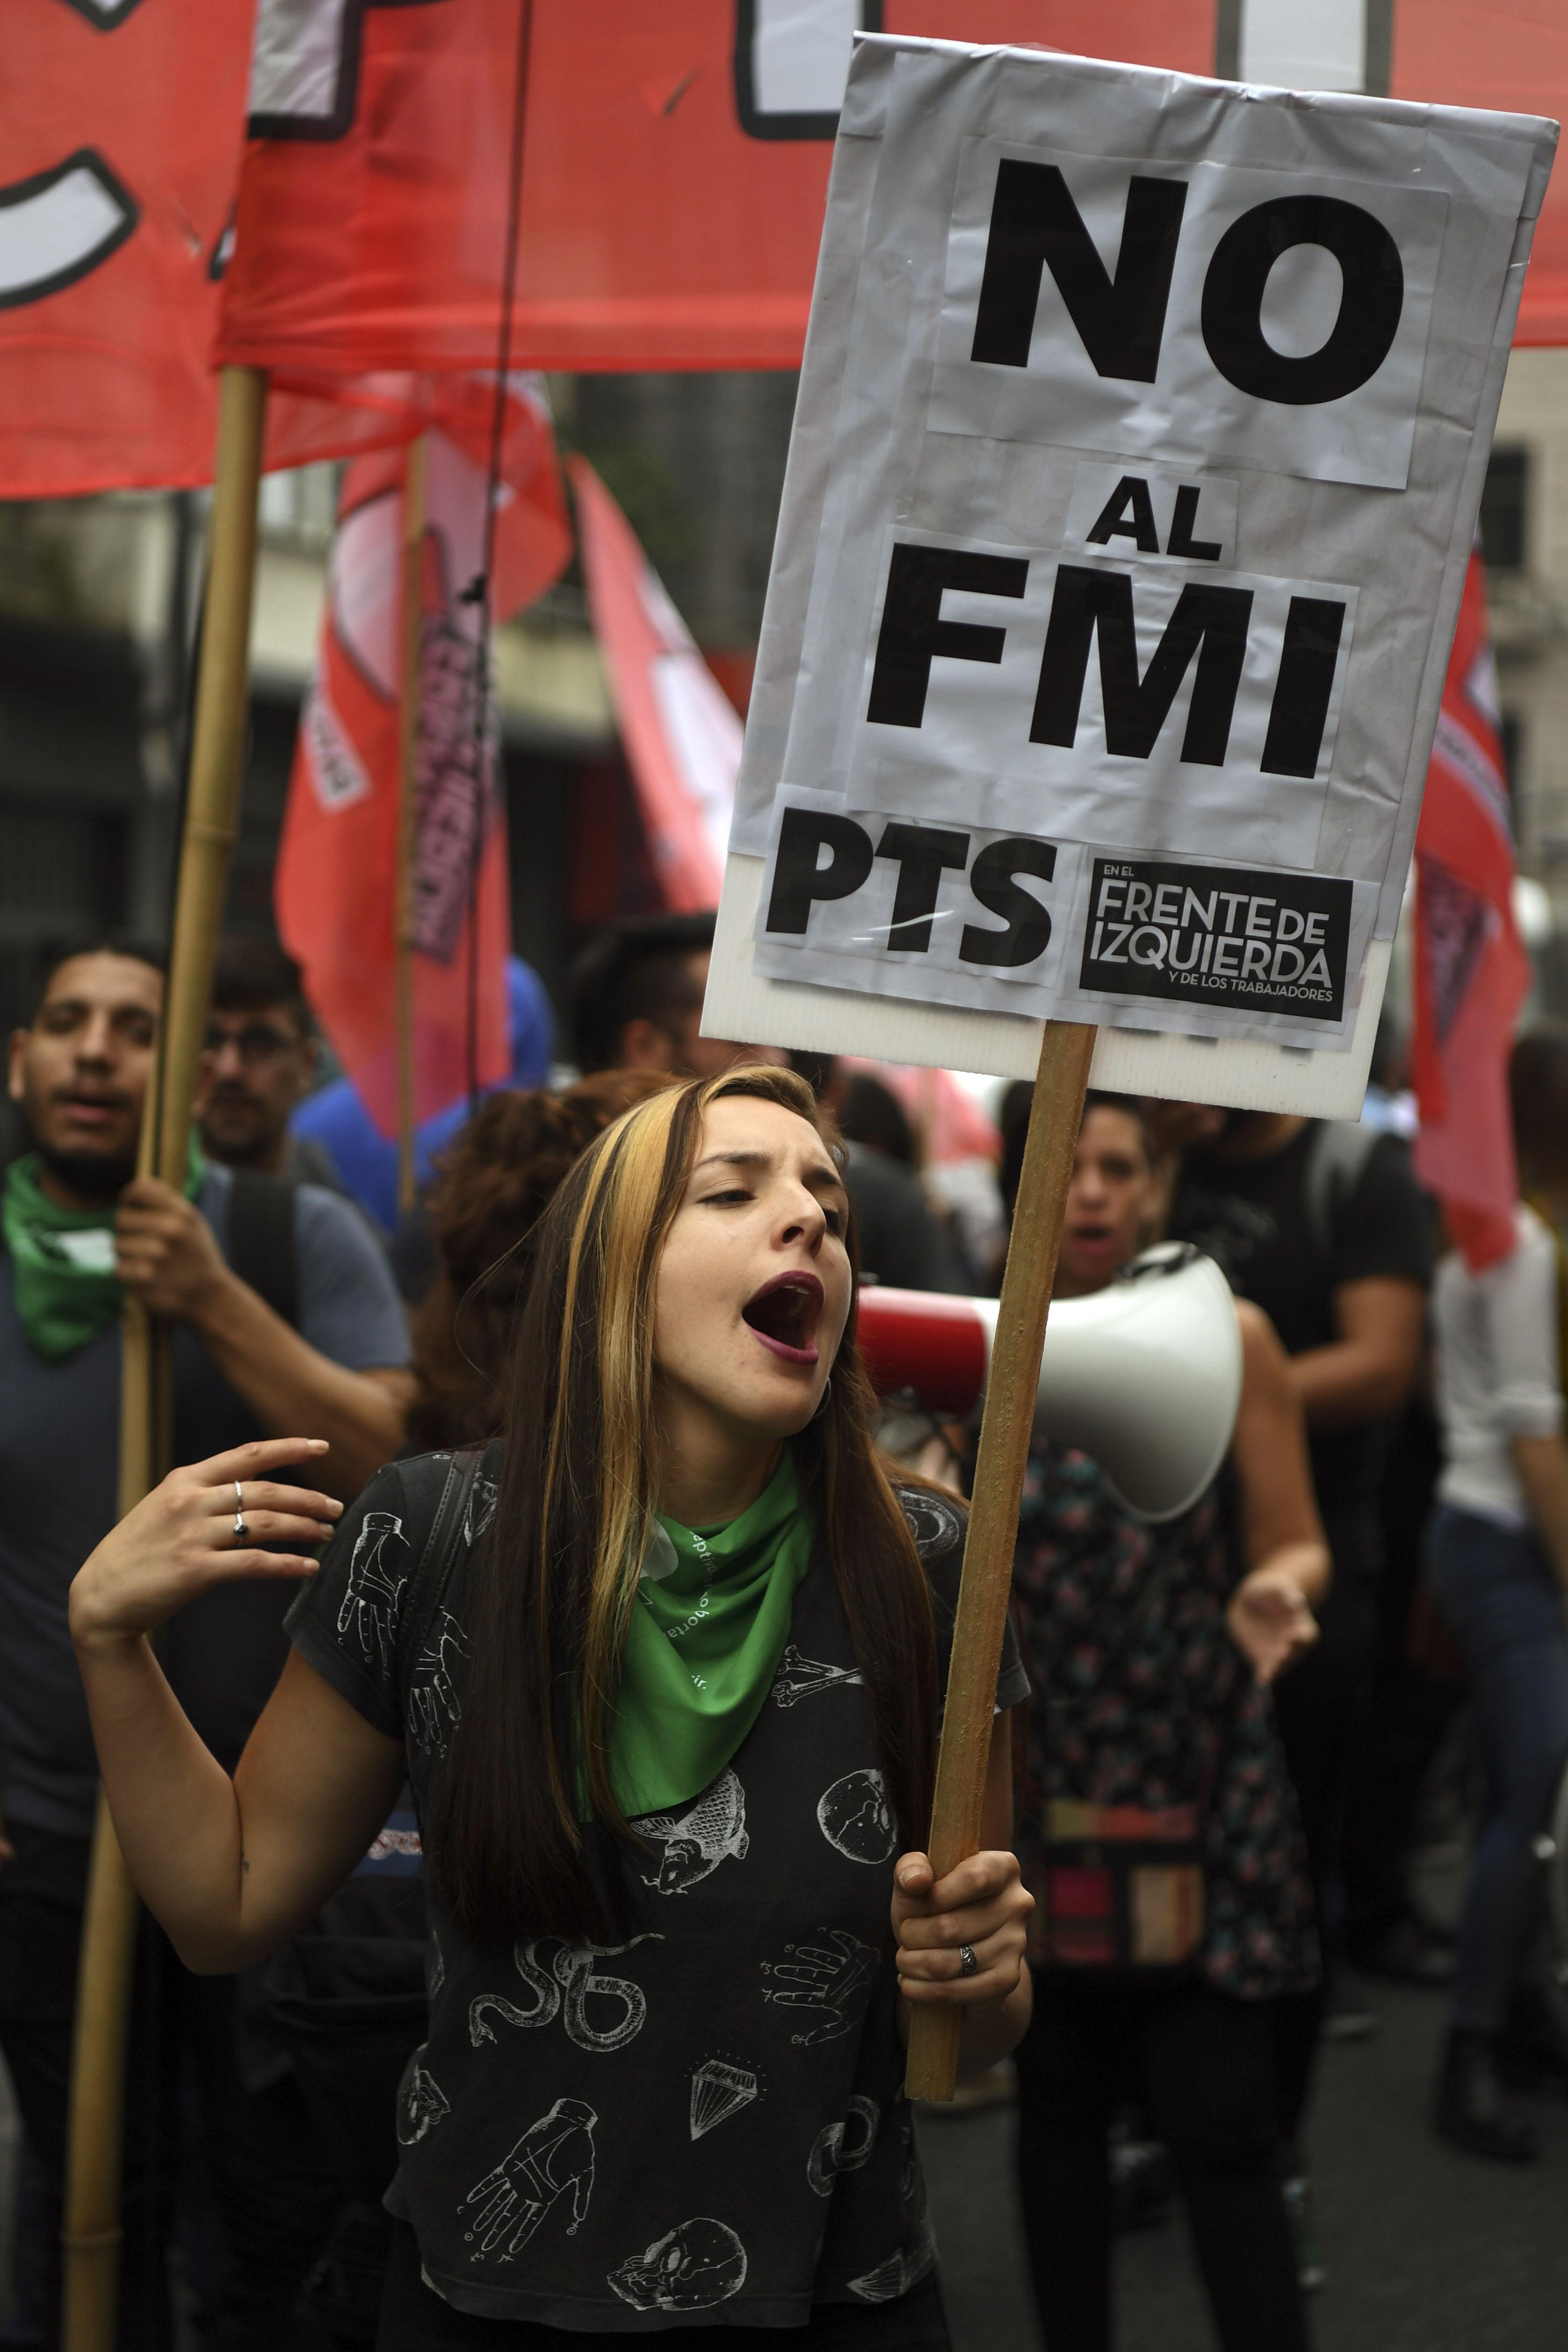 تظاهرات ضد مفاوضات الحكومة مع صندوق النقد